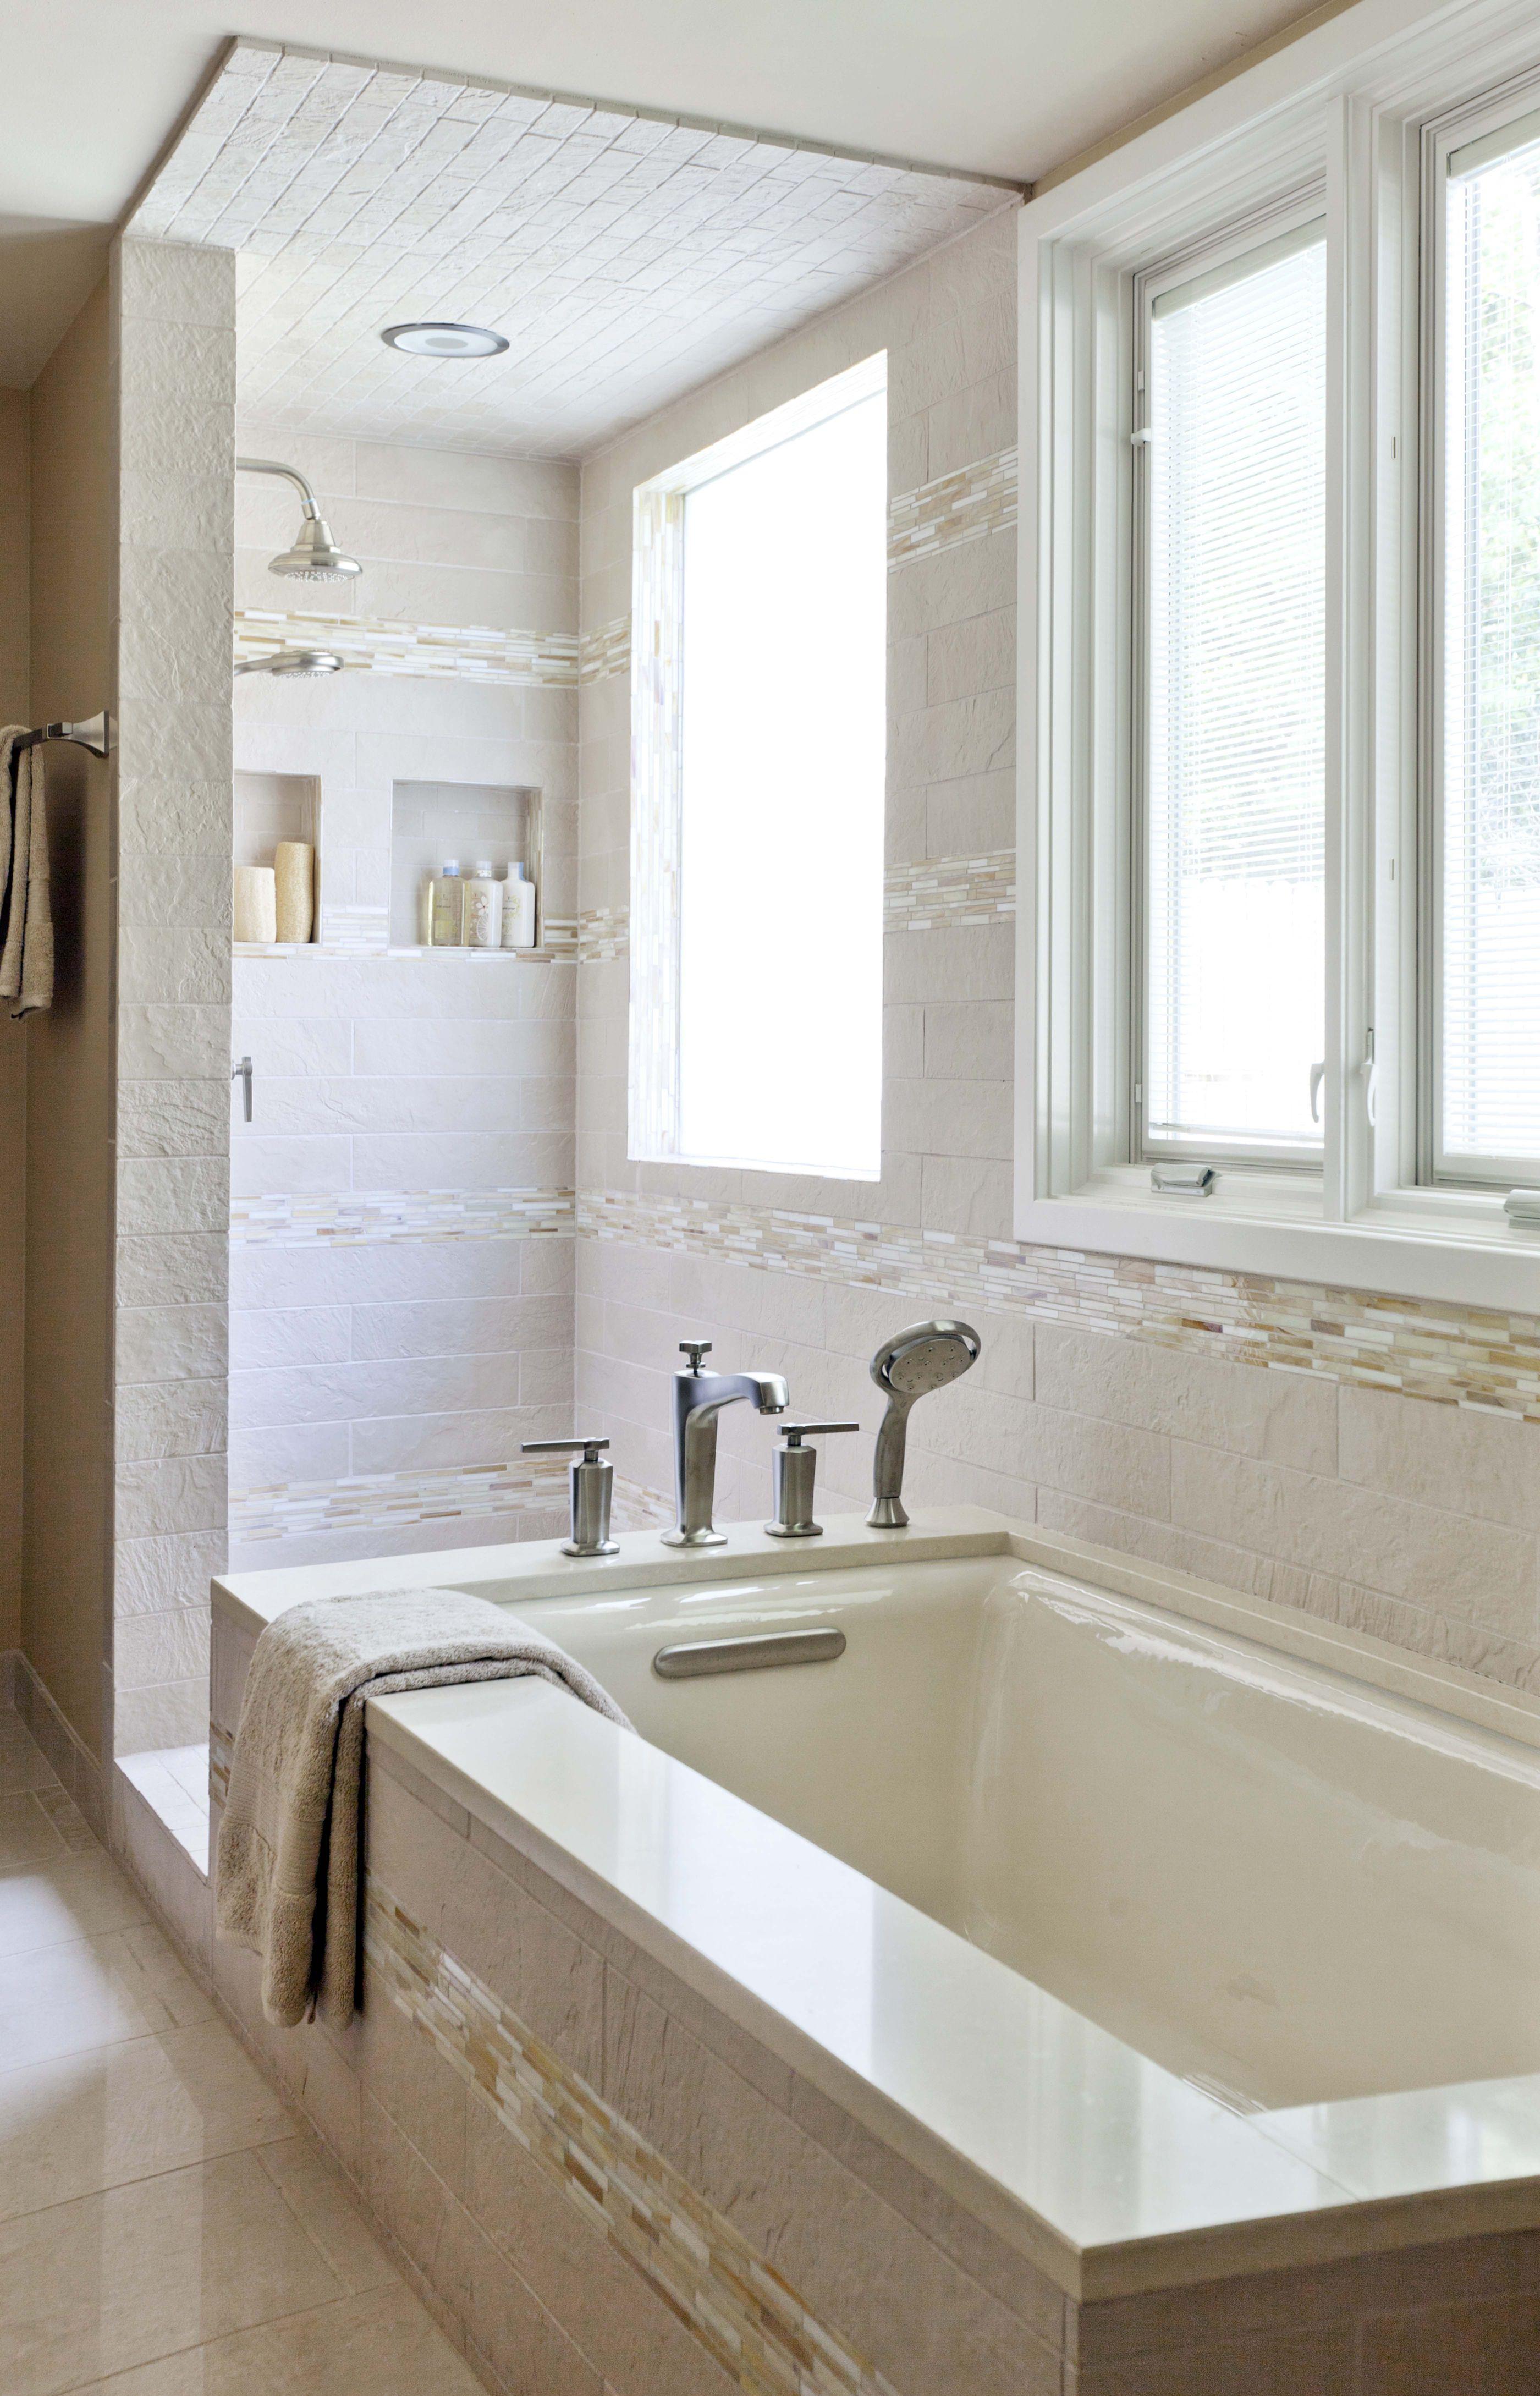 Architecture Img 3293 Kohler Bath Tub Jpg 2800 4356 Bathroom Design Master Bathroom Design Bathroom Interior Decorating Kohler bathroom design ideas